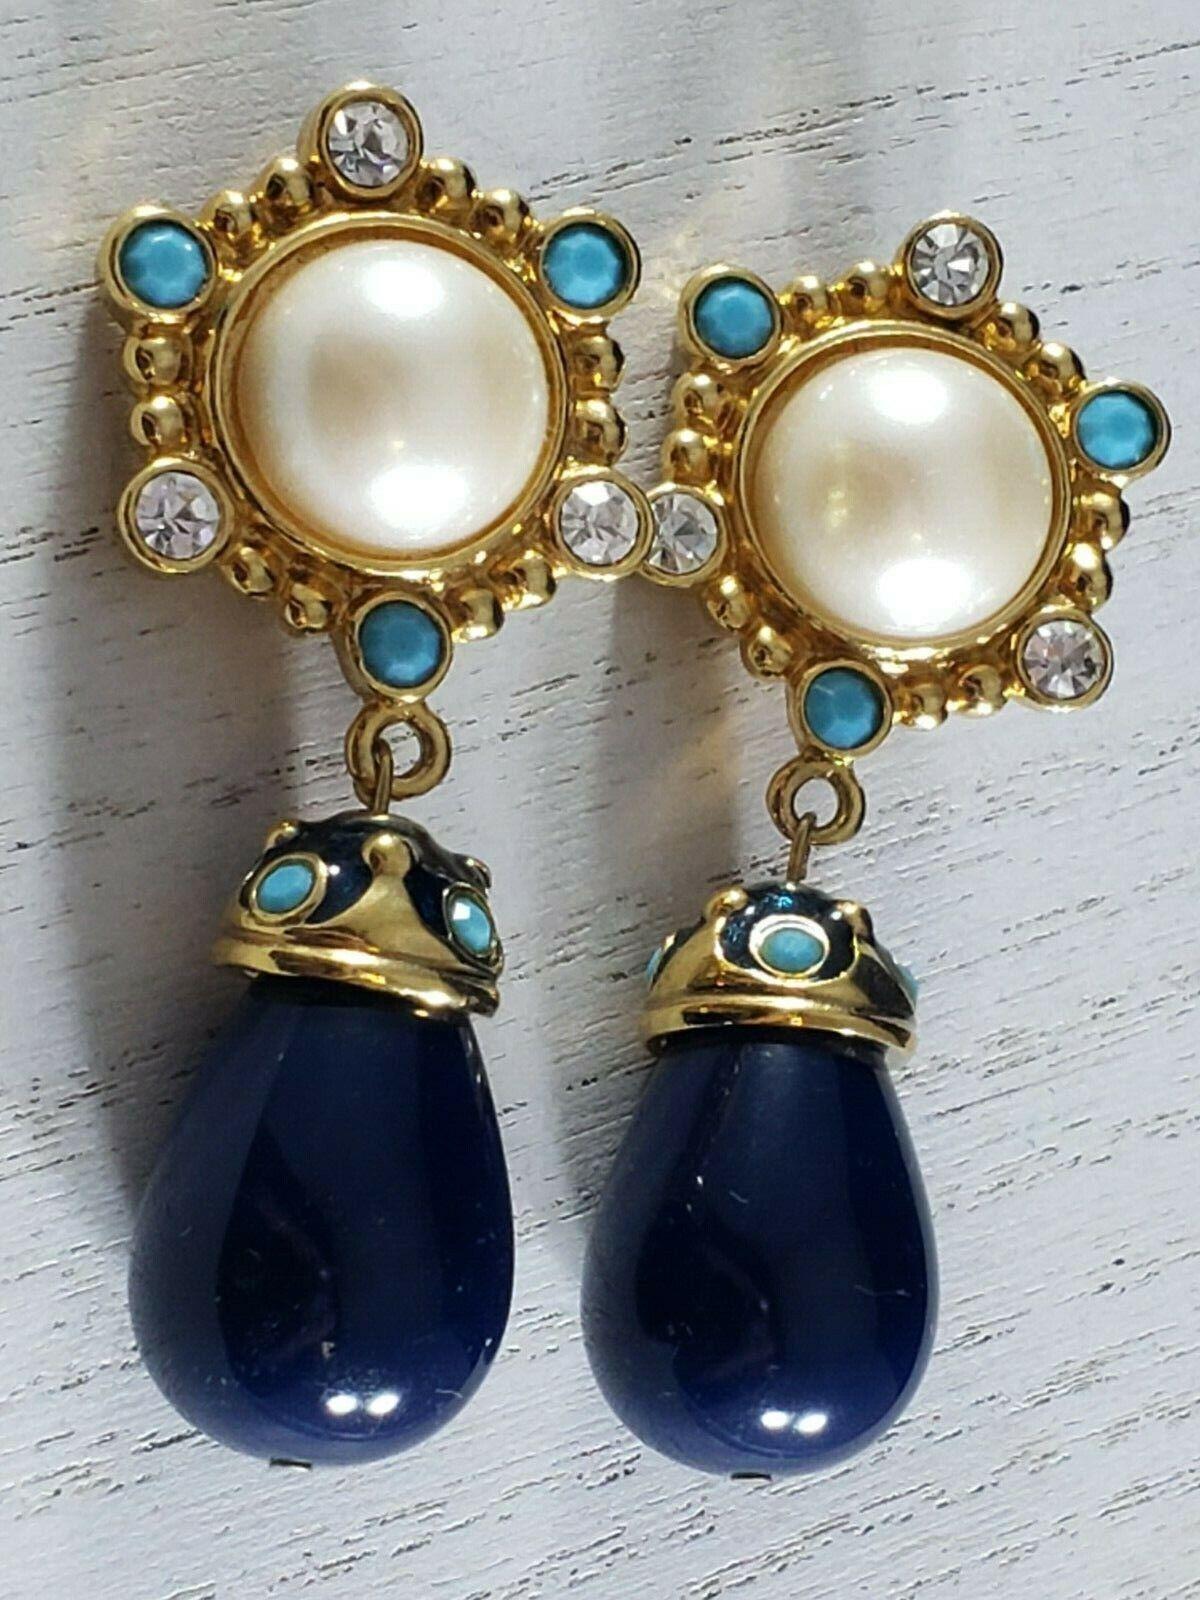 Vintage Jose Barrera For Avon Gold Tone Rhinestone Faux Pearl Dangle Earrings - $99.99